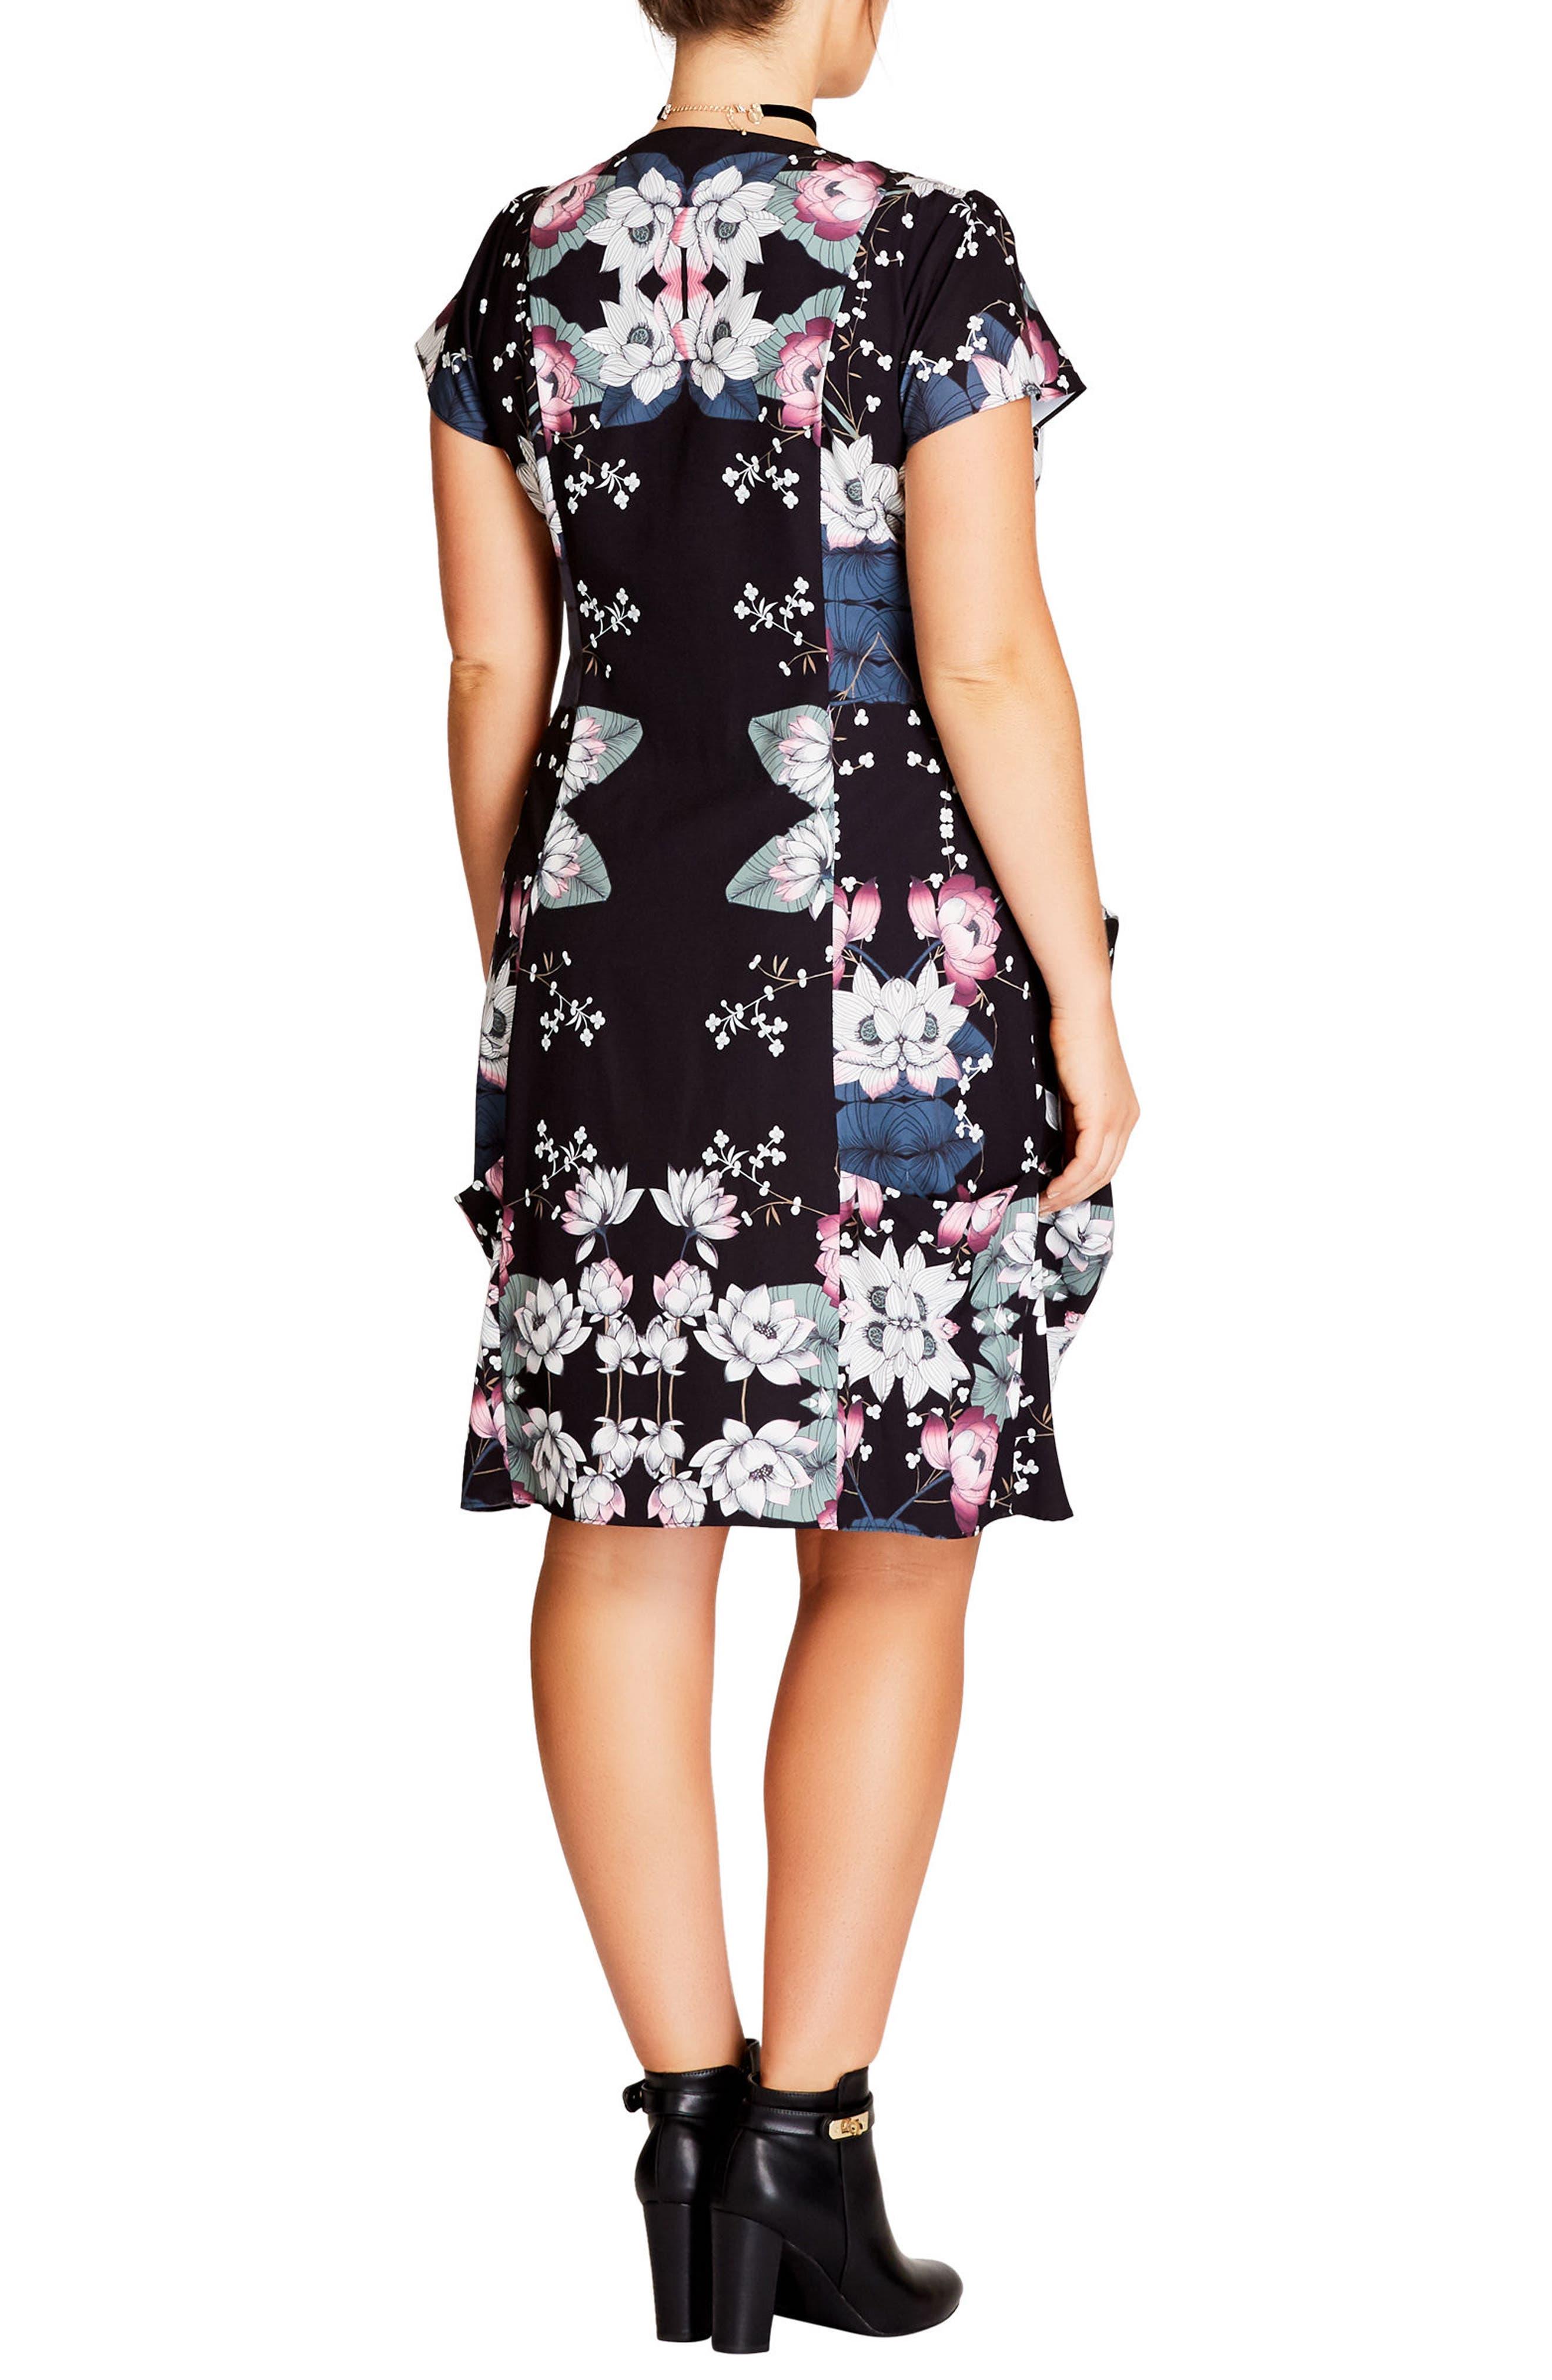 Saigon Floral Tunic Dress,                             Alternate thumbnail 2, color,                             001